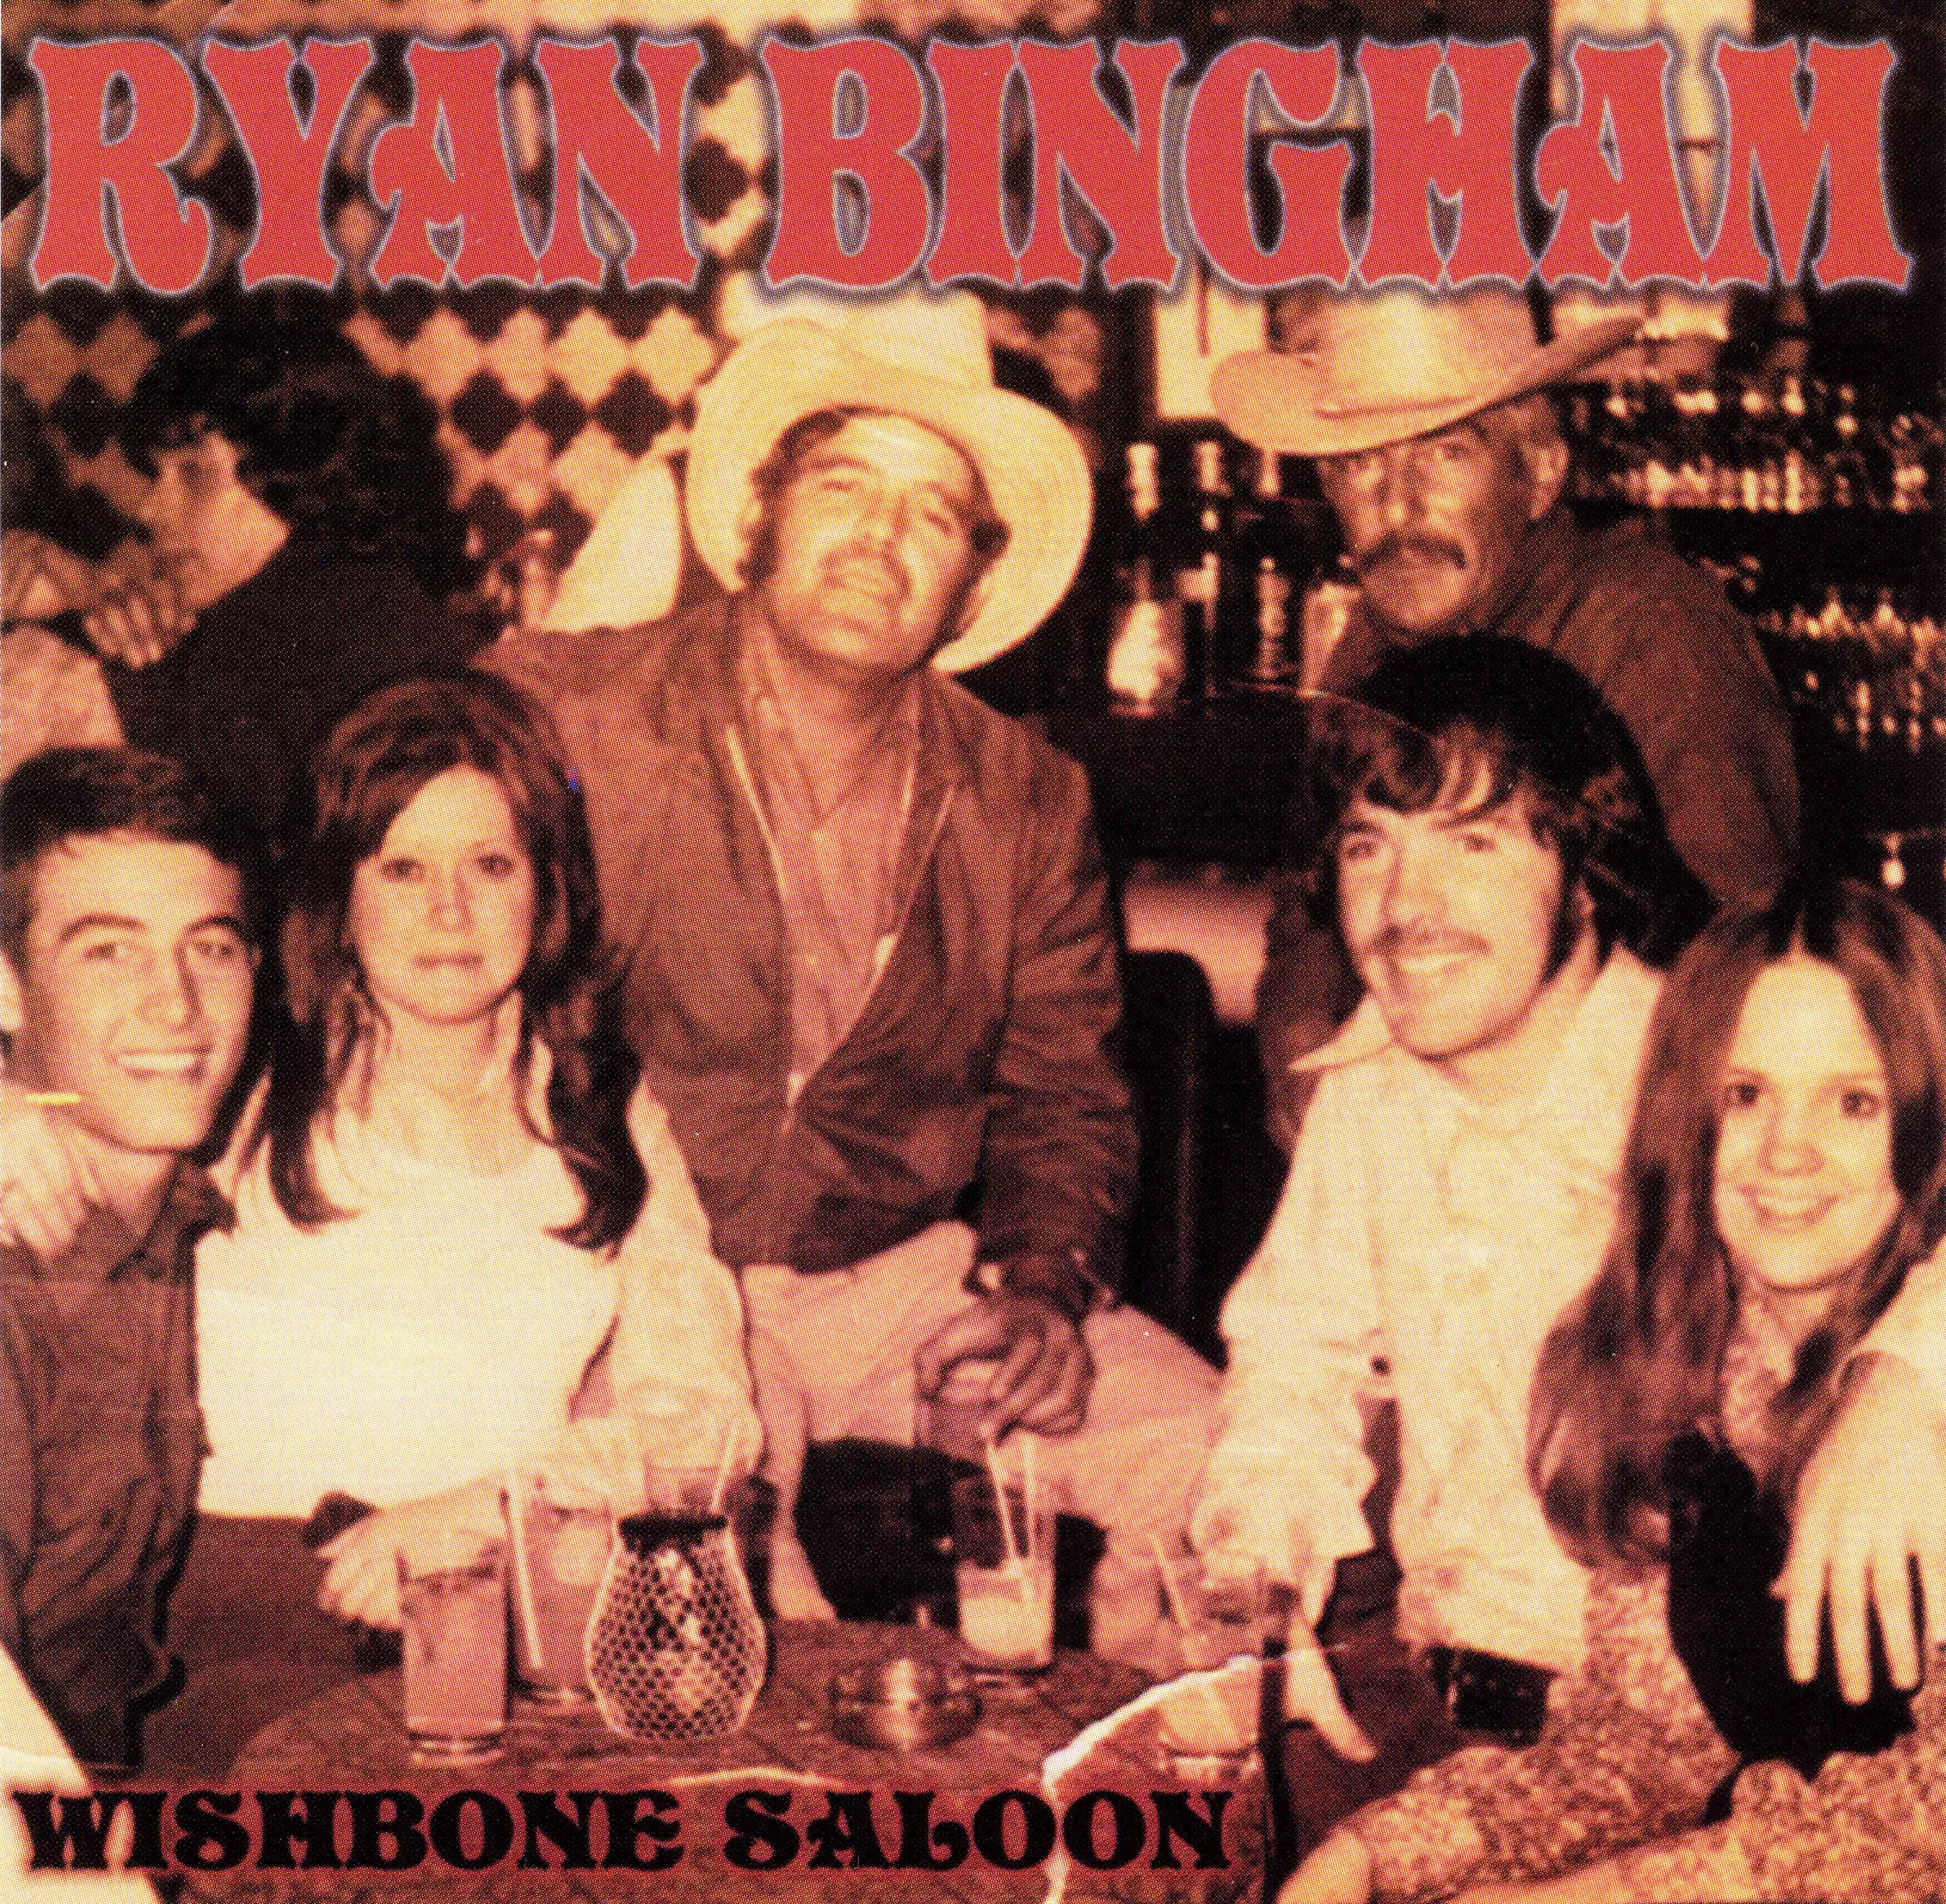 Ryan Bingham - Dead Horses (2006) CD 8